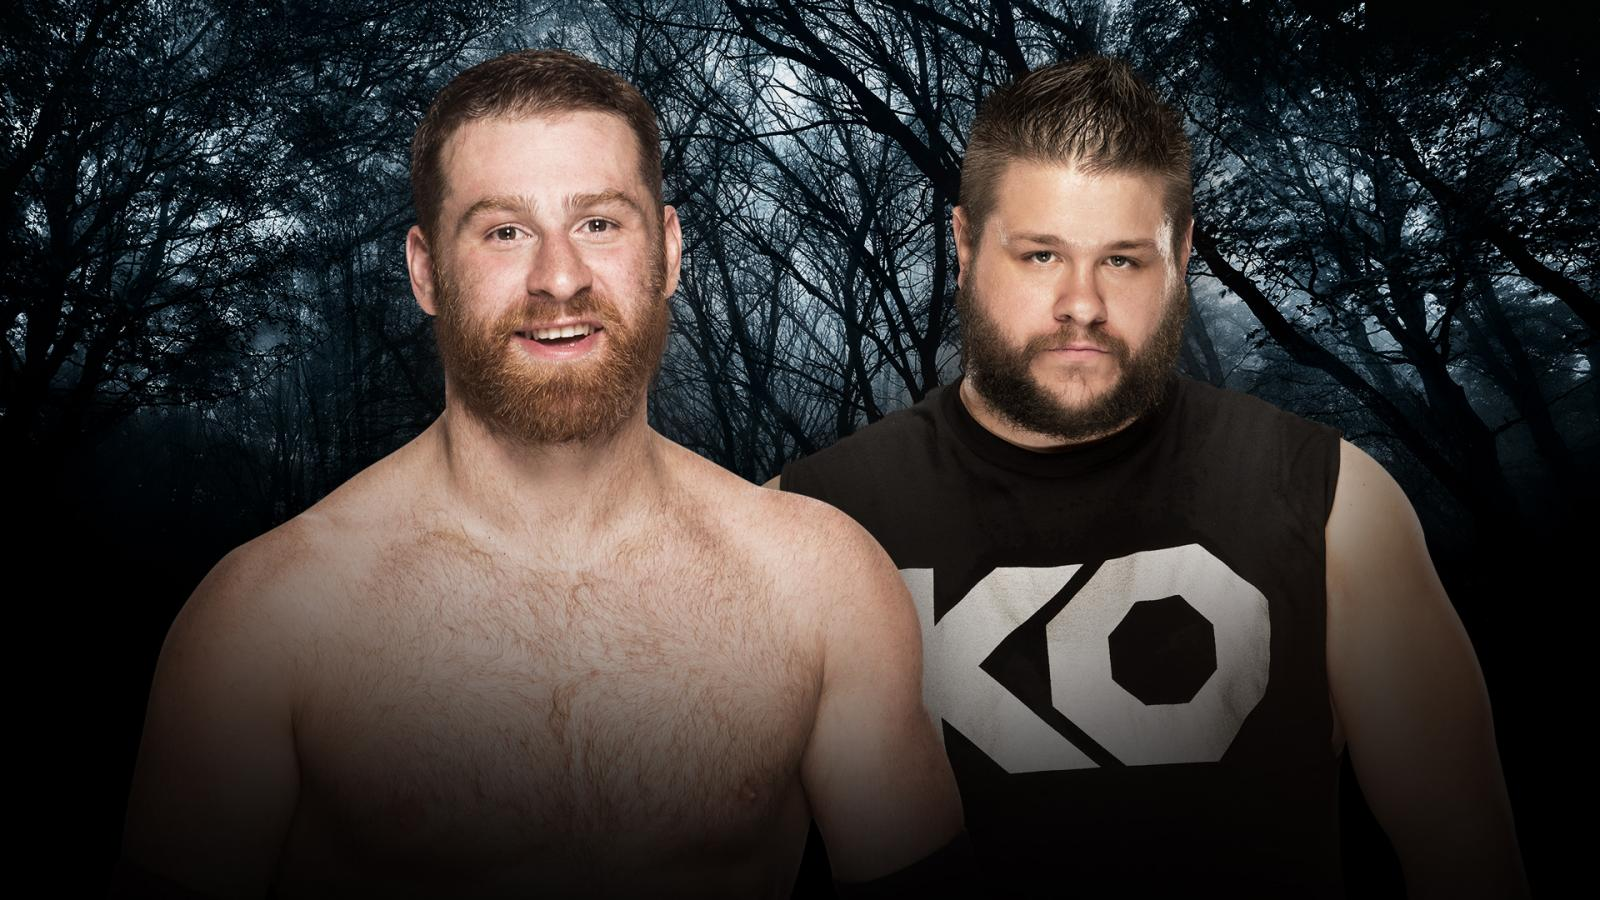 WWE Payback - Sami Zayn Vs. Kevin Owens